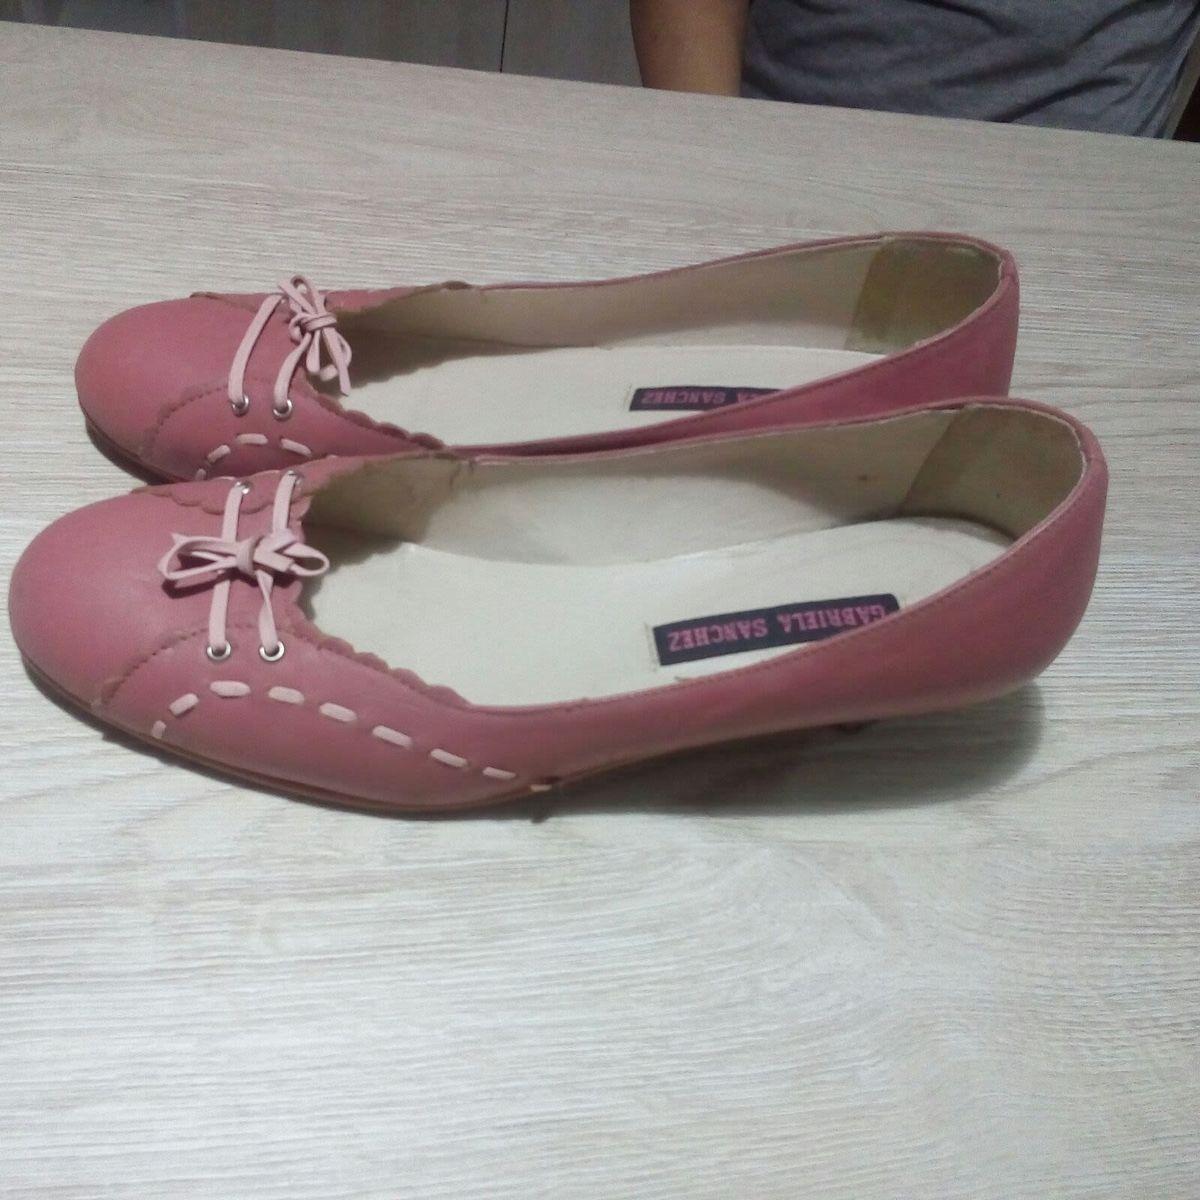 fb076f3e0 vende-se sapato gabriela sanches,numero 37!super conservado! - sapatos  gabriela